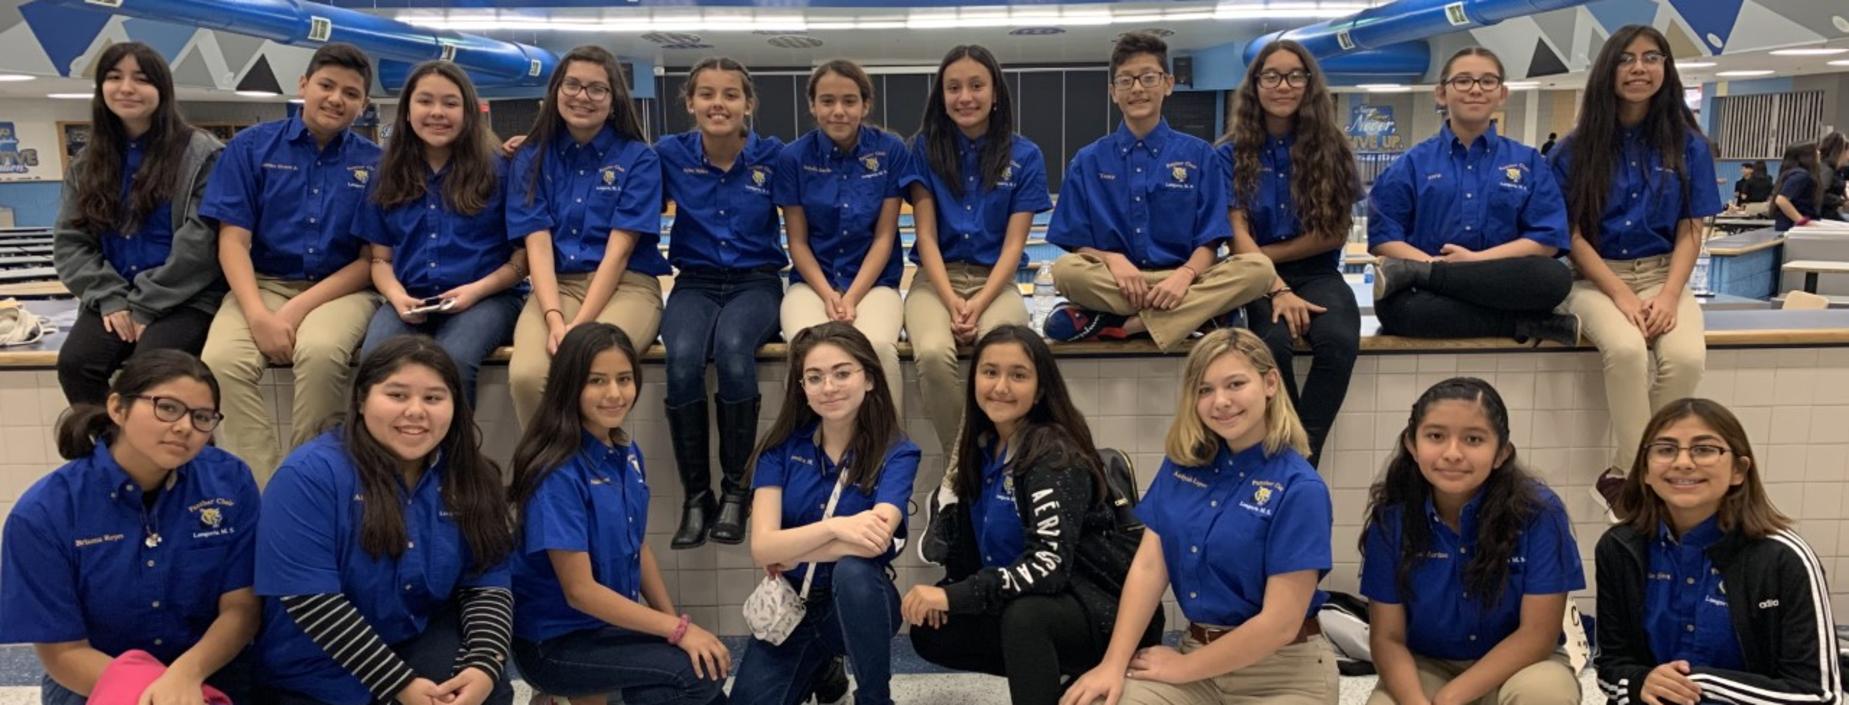 Choir students at Robert Vela High School